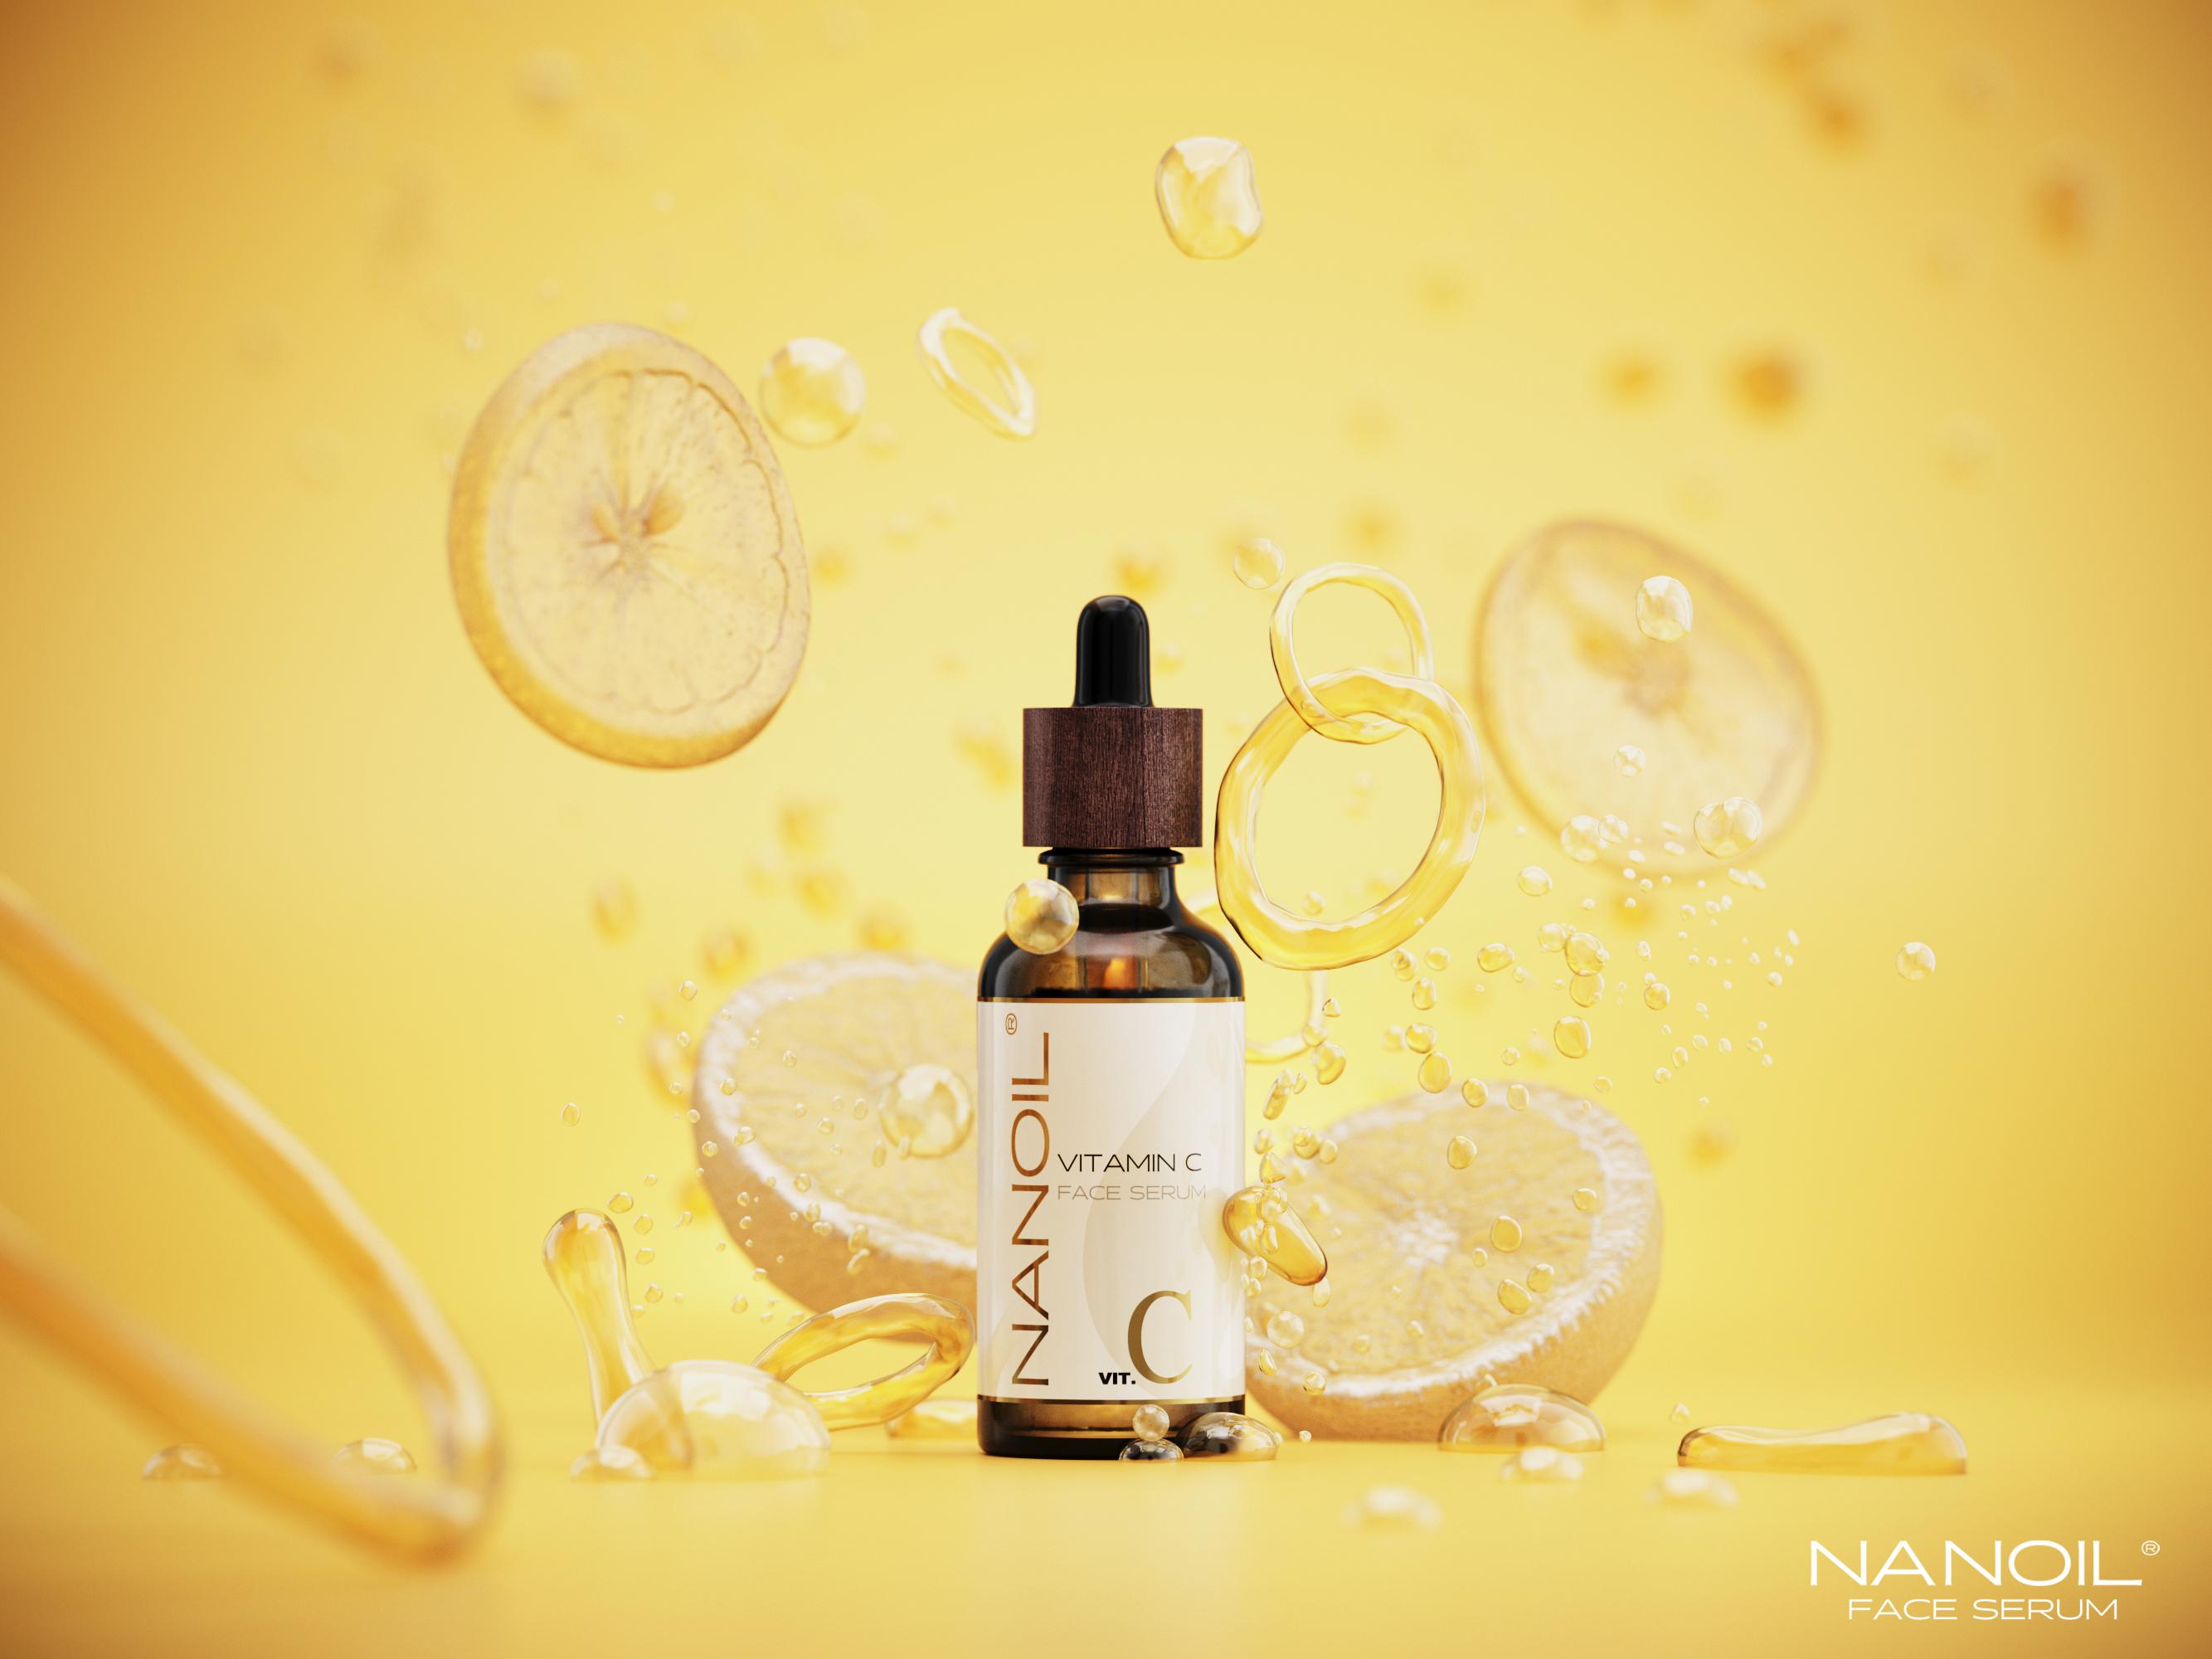 kedvenc arcszérum C-vitaminnal Nanoil